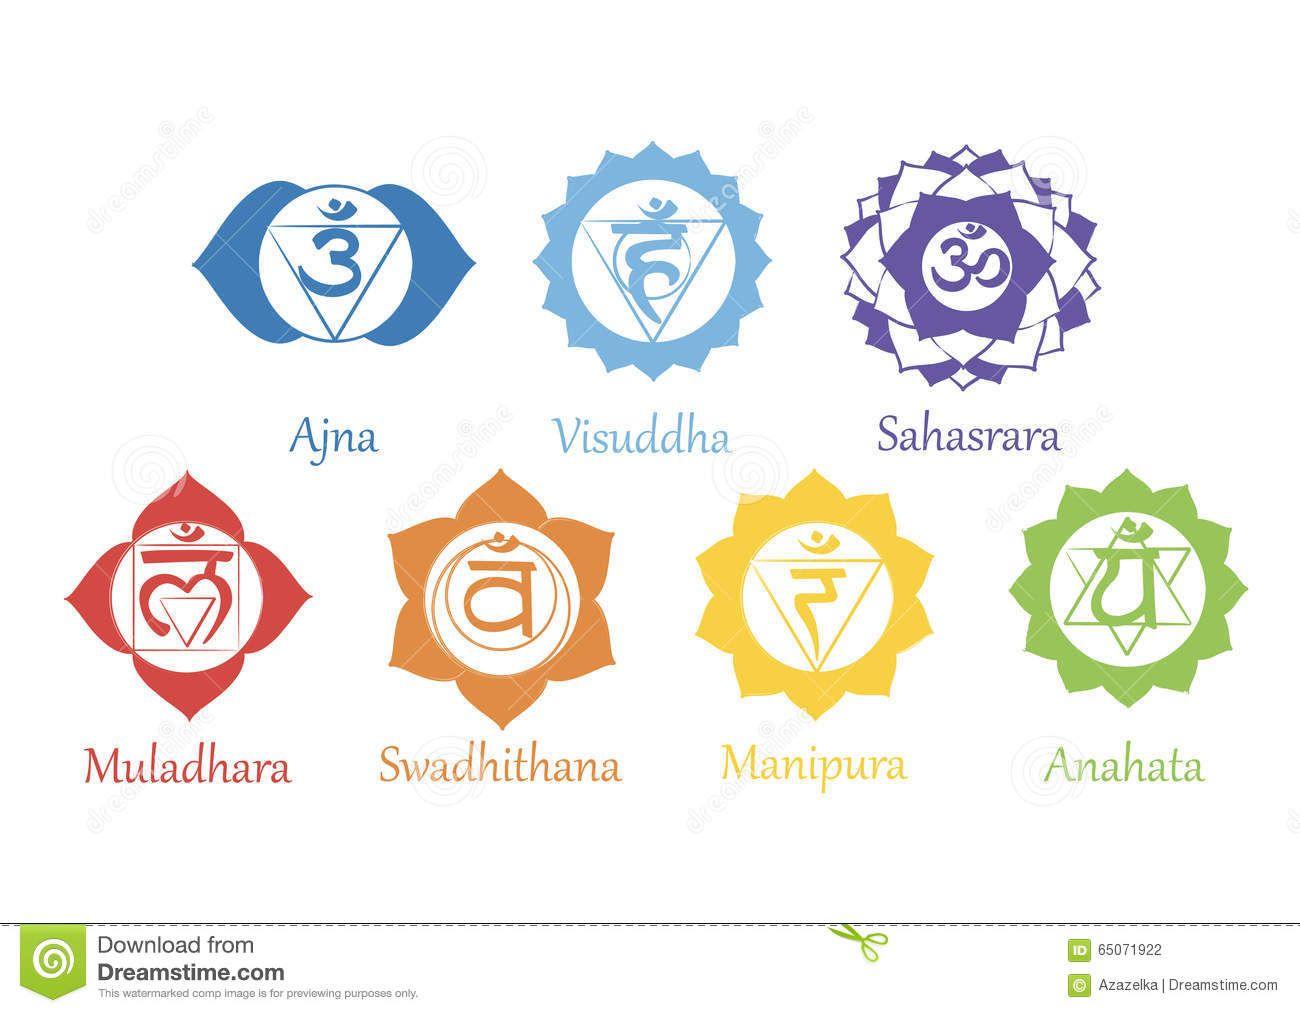 Chakras icons concept chakras used hinduism buddhism ayurveda design chakras icons concept chakras used hinduism buddhism ayurveda buycottarizona Gallery